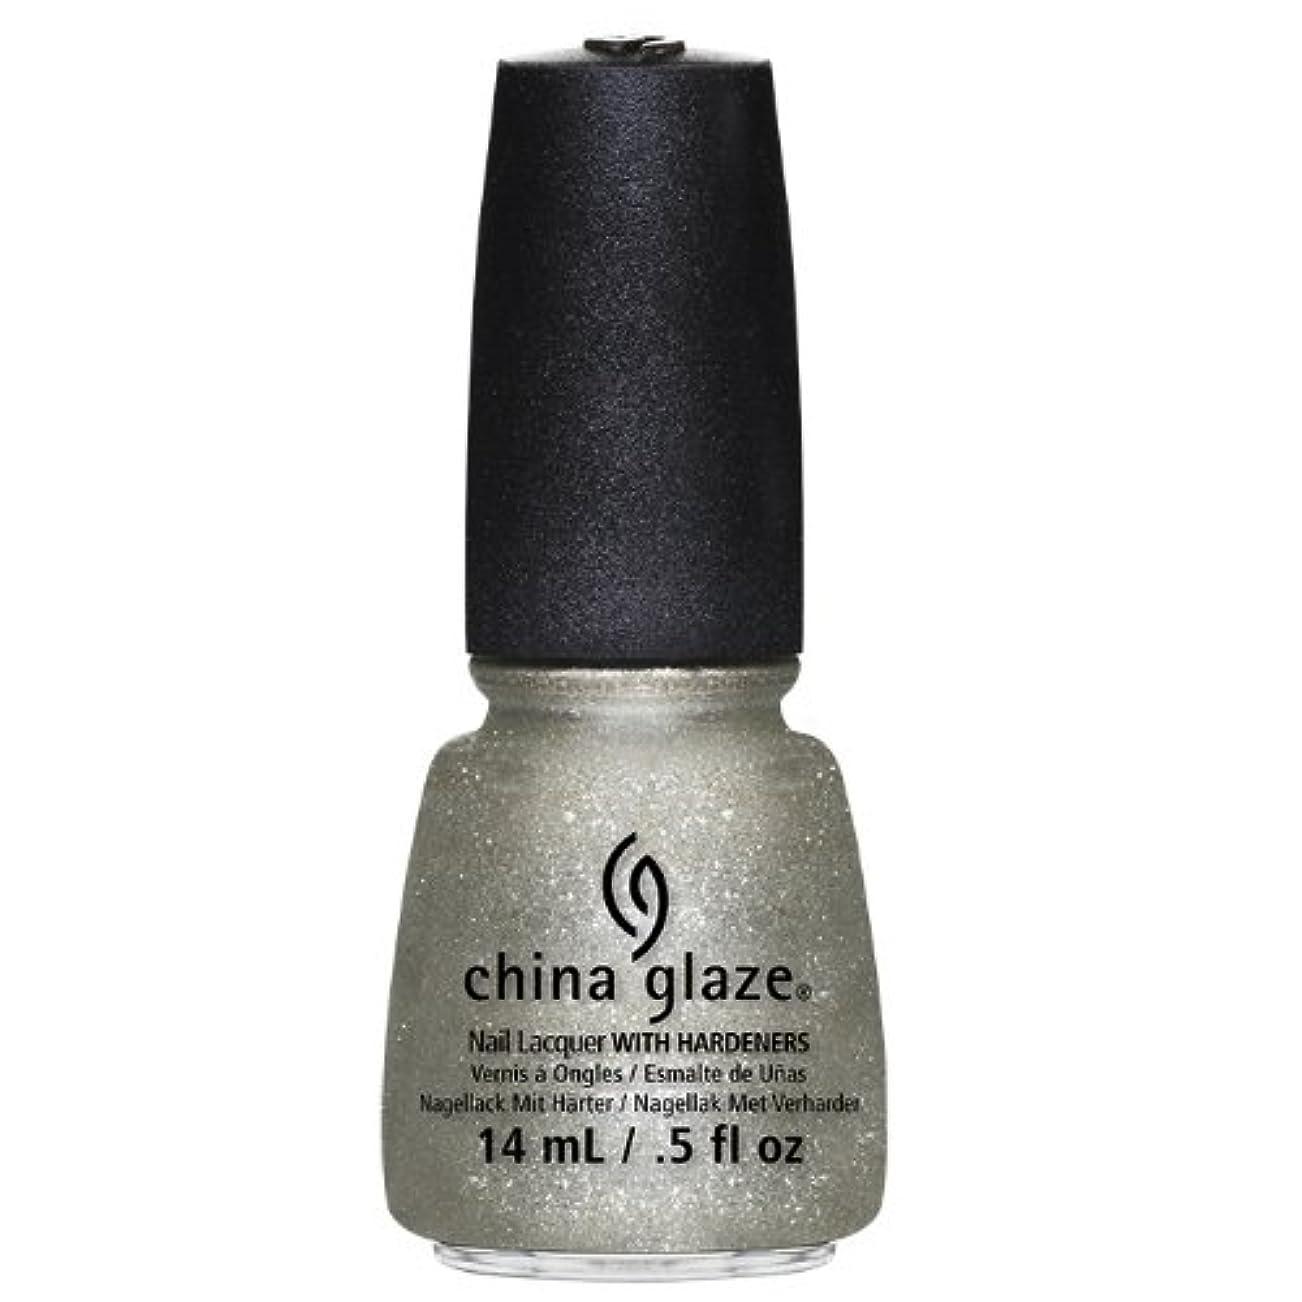 CHINA GLAZE Nail Lacquer - Autumn Nights - Gossip Over Gimlets (並行輸入品)